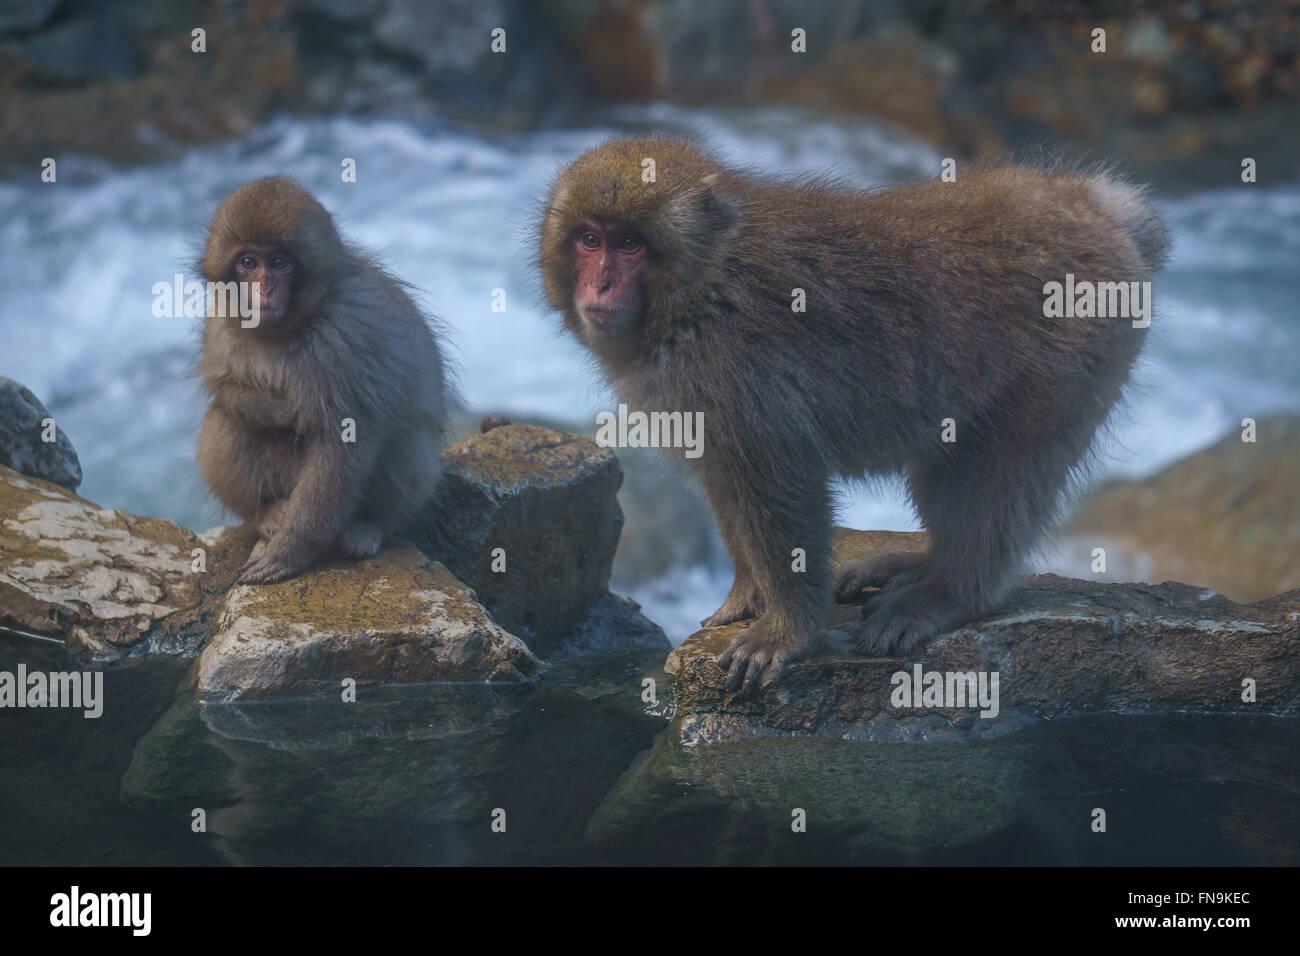 Japanese macaques by Yokoyu river, Jigokudani Monkey Park, Nagano, Japan - Stock Image